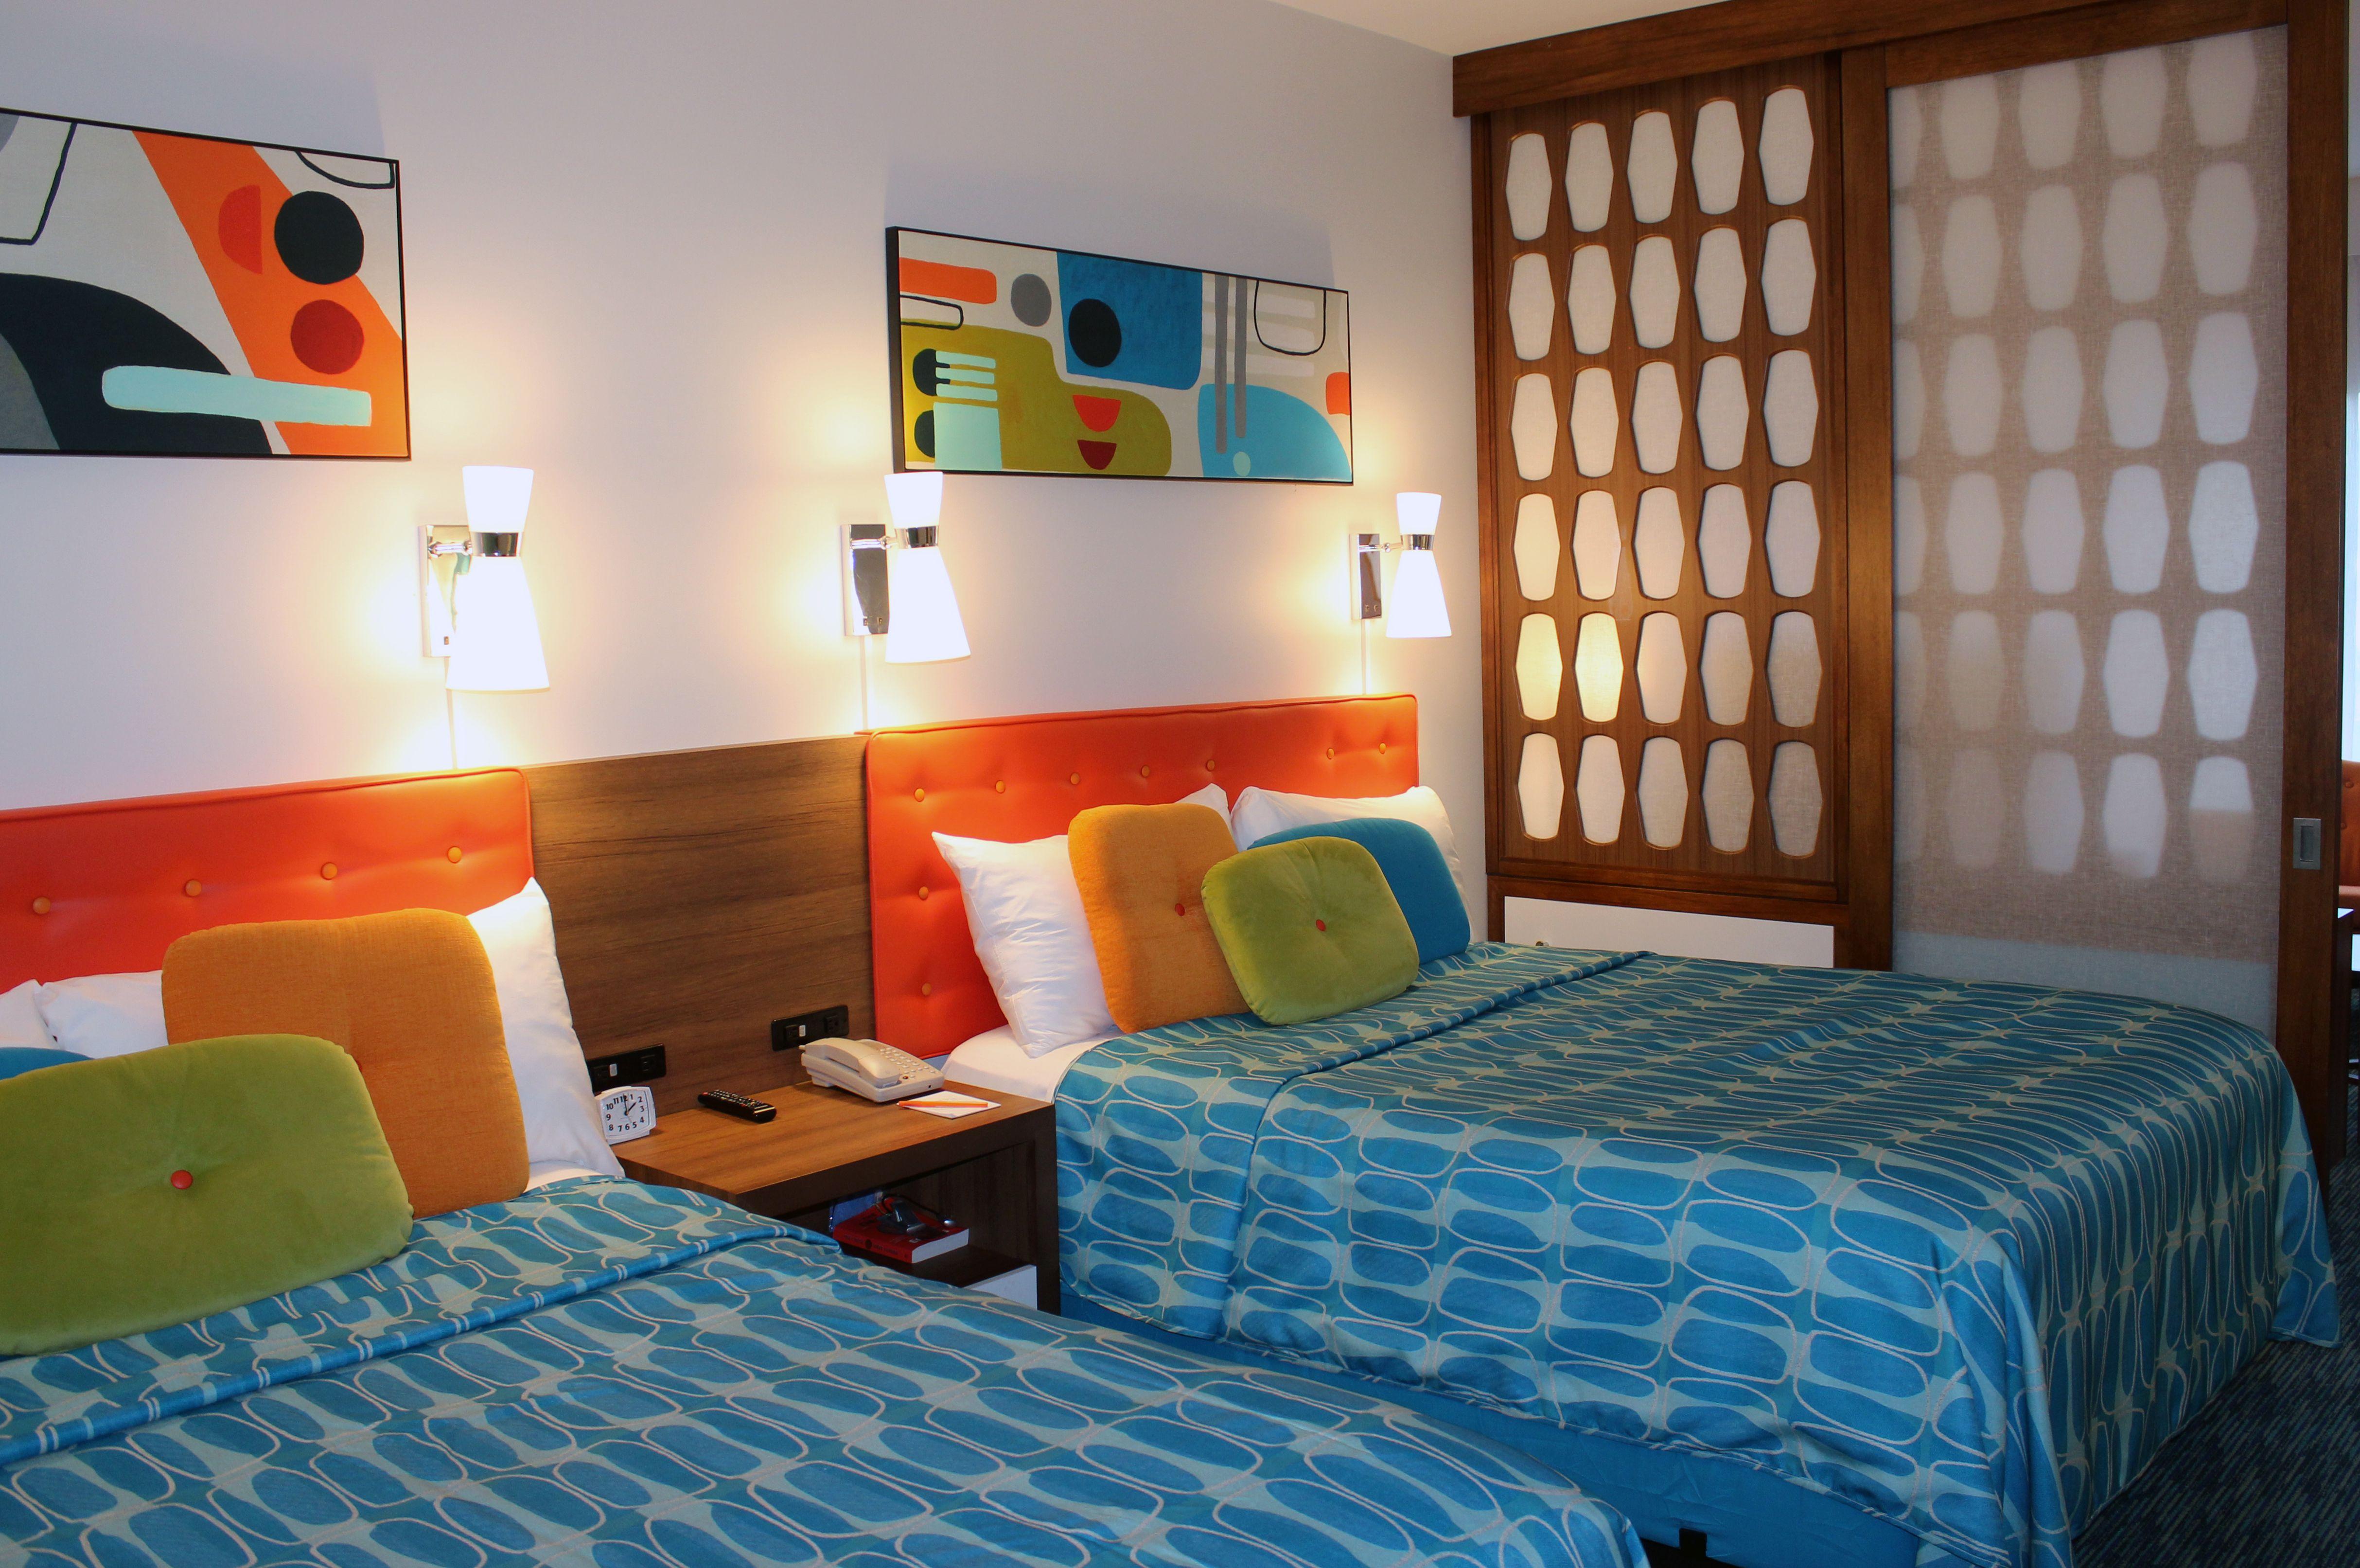 Cabana Bay Universal Orlando Beds